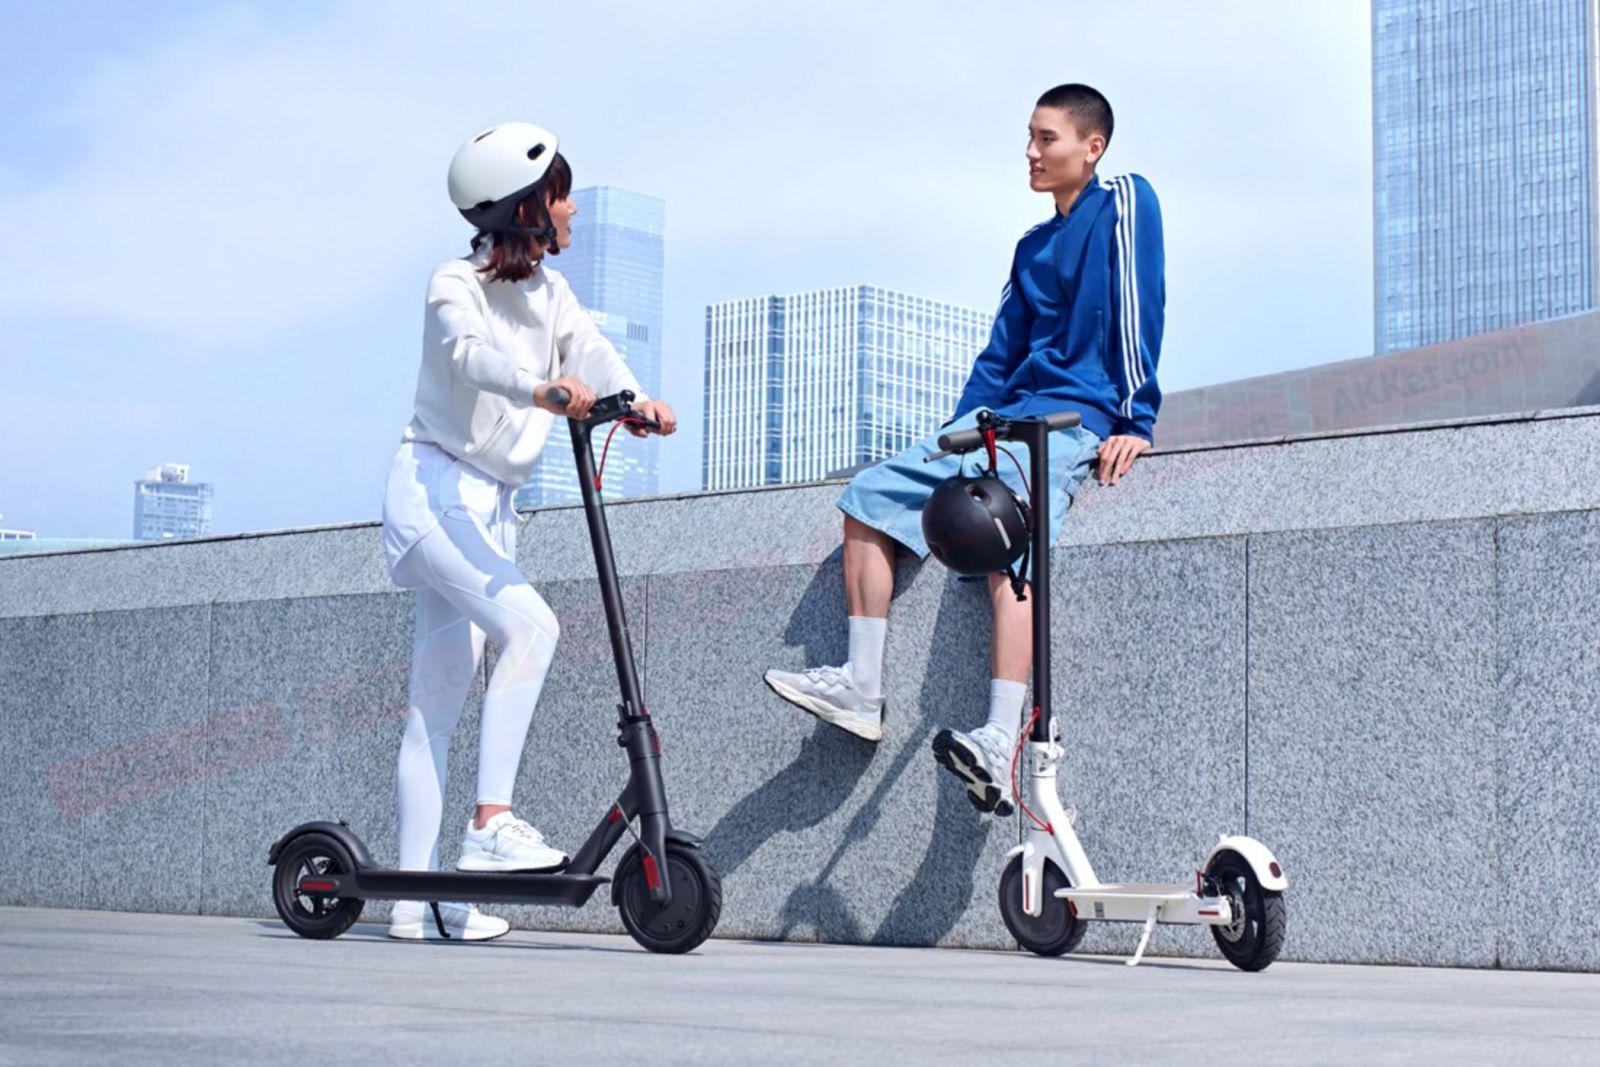 Xiaomi выпускает электросамокат Mijia Scooter 1S за 282 доллара (xiaomi mijia scooter 1s elektosamokat 2020 novyi 9)